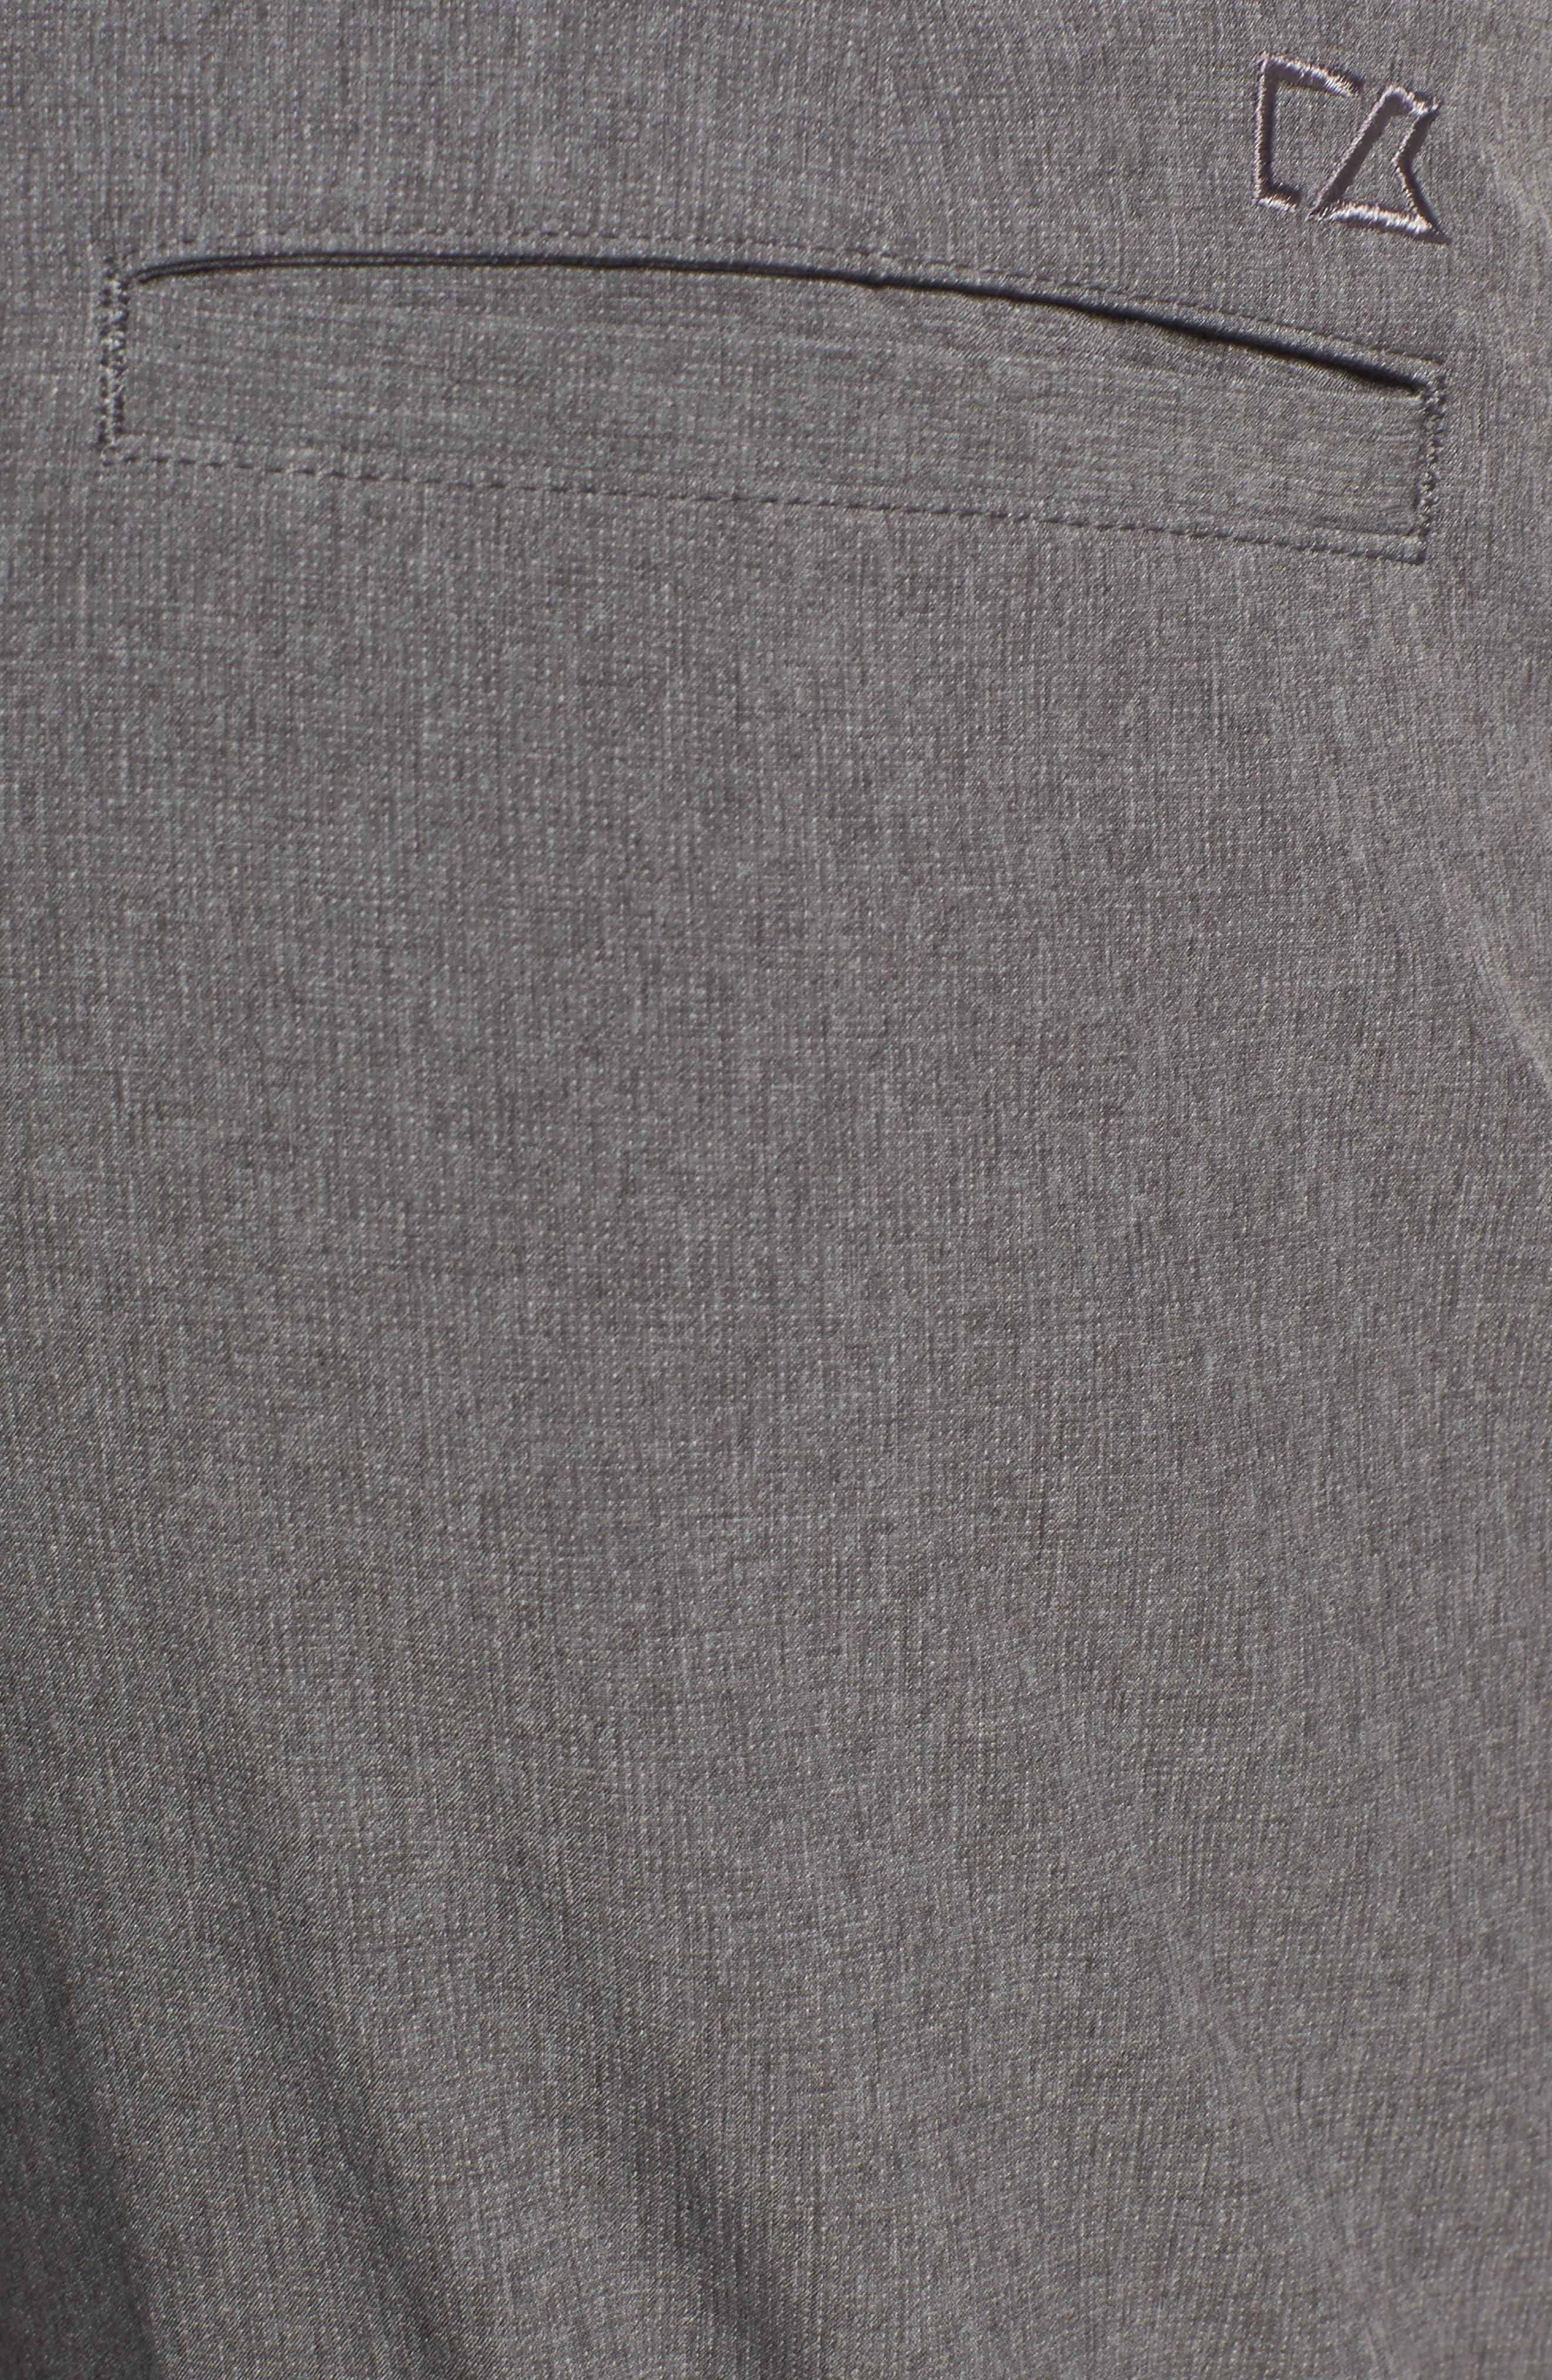 Bainbridge DryTec Moisture Wicking Flat Front Pants,                             Alternate thumbnail 2, color,                             IRON GREY